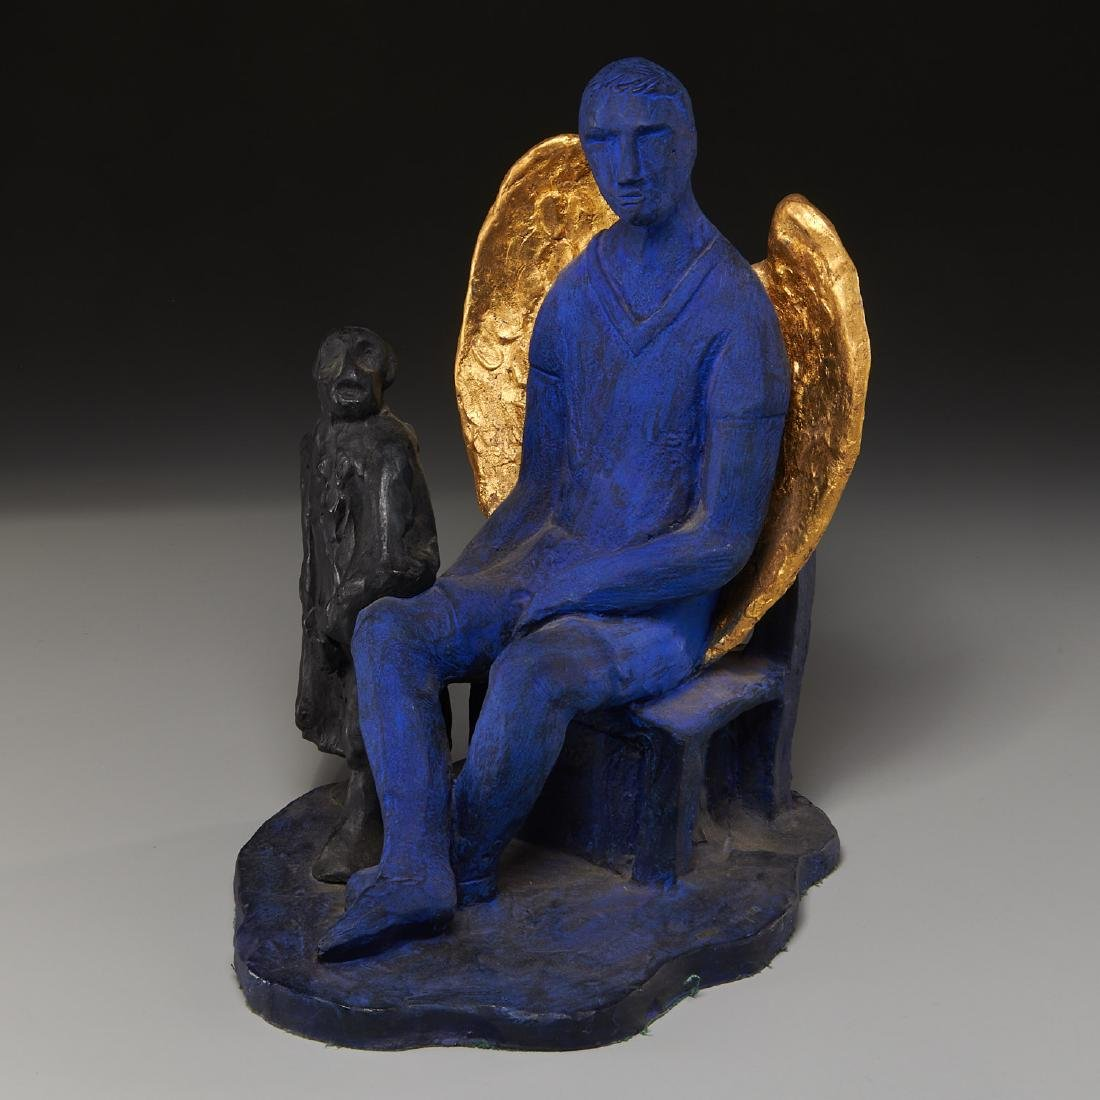 Sandro Chia, sculpture